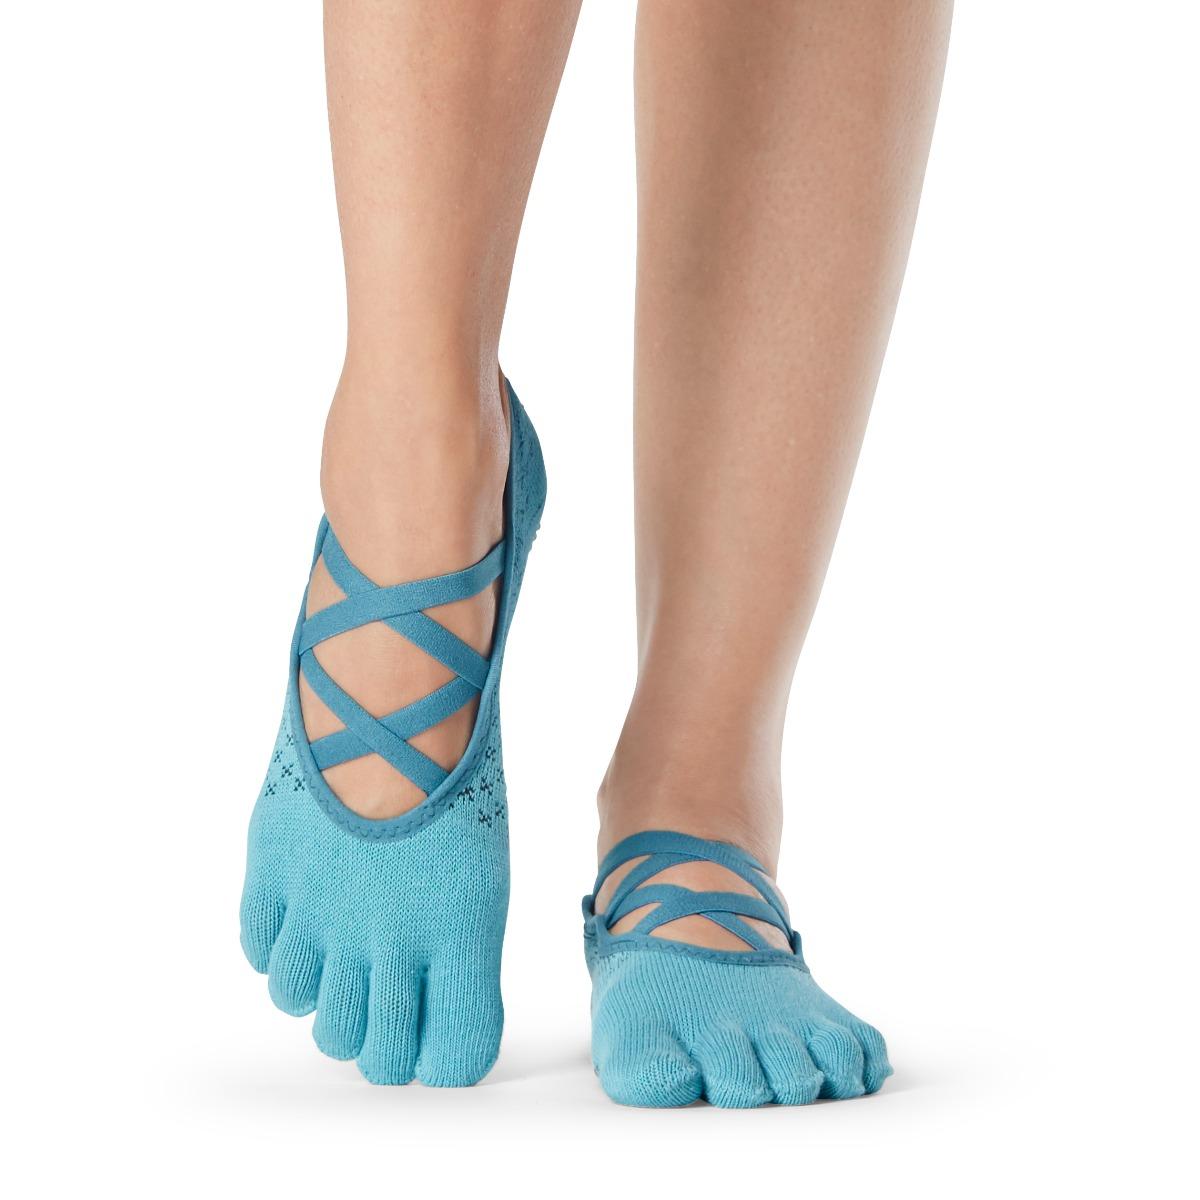 Yogasocken ToeSox Elle Full Toe Glacial - 1